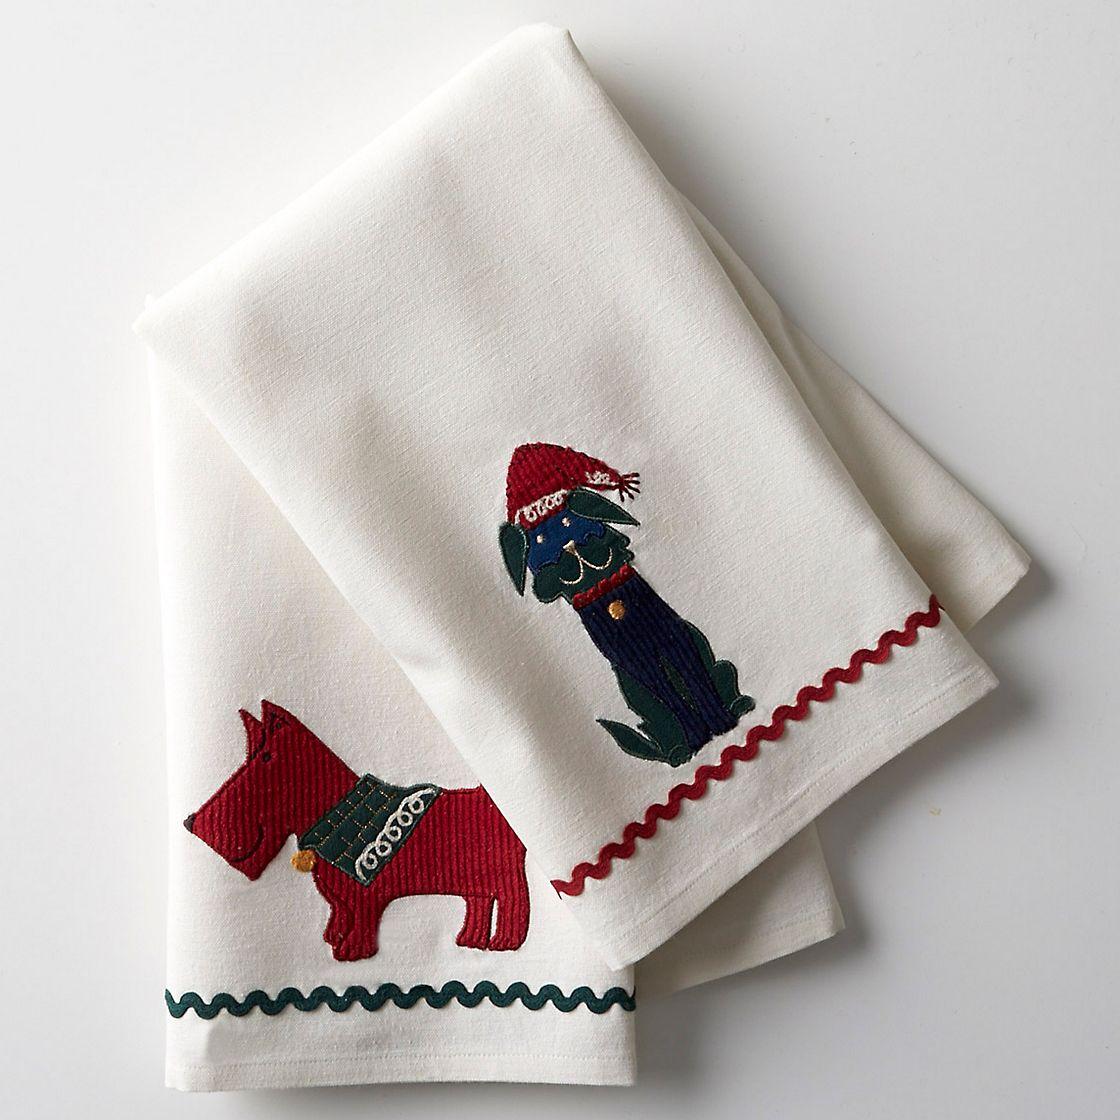 Christmas Kitchen Towels At Walmart: Dog Holiday Kitchen Towels